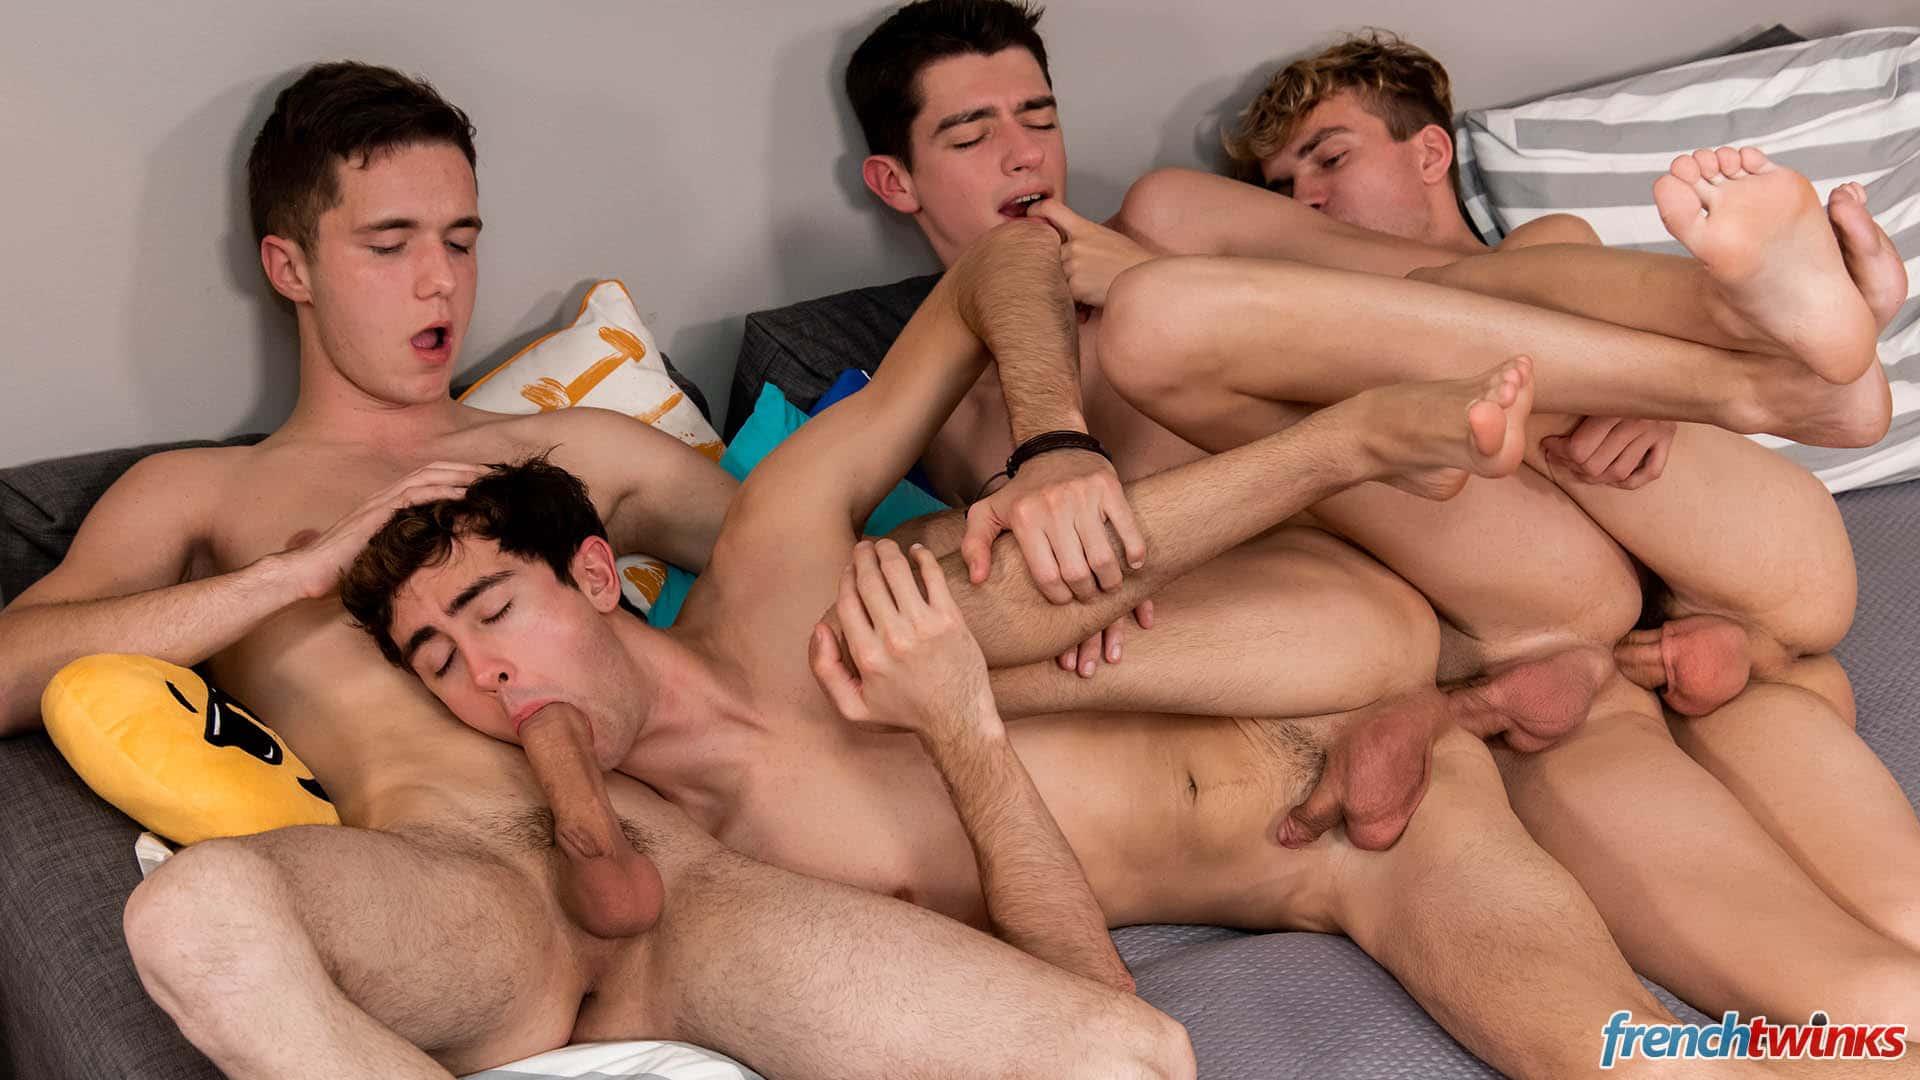 Boys having group sex